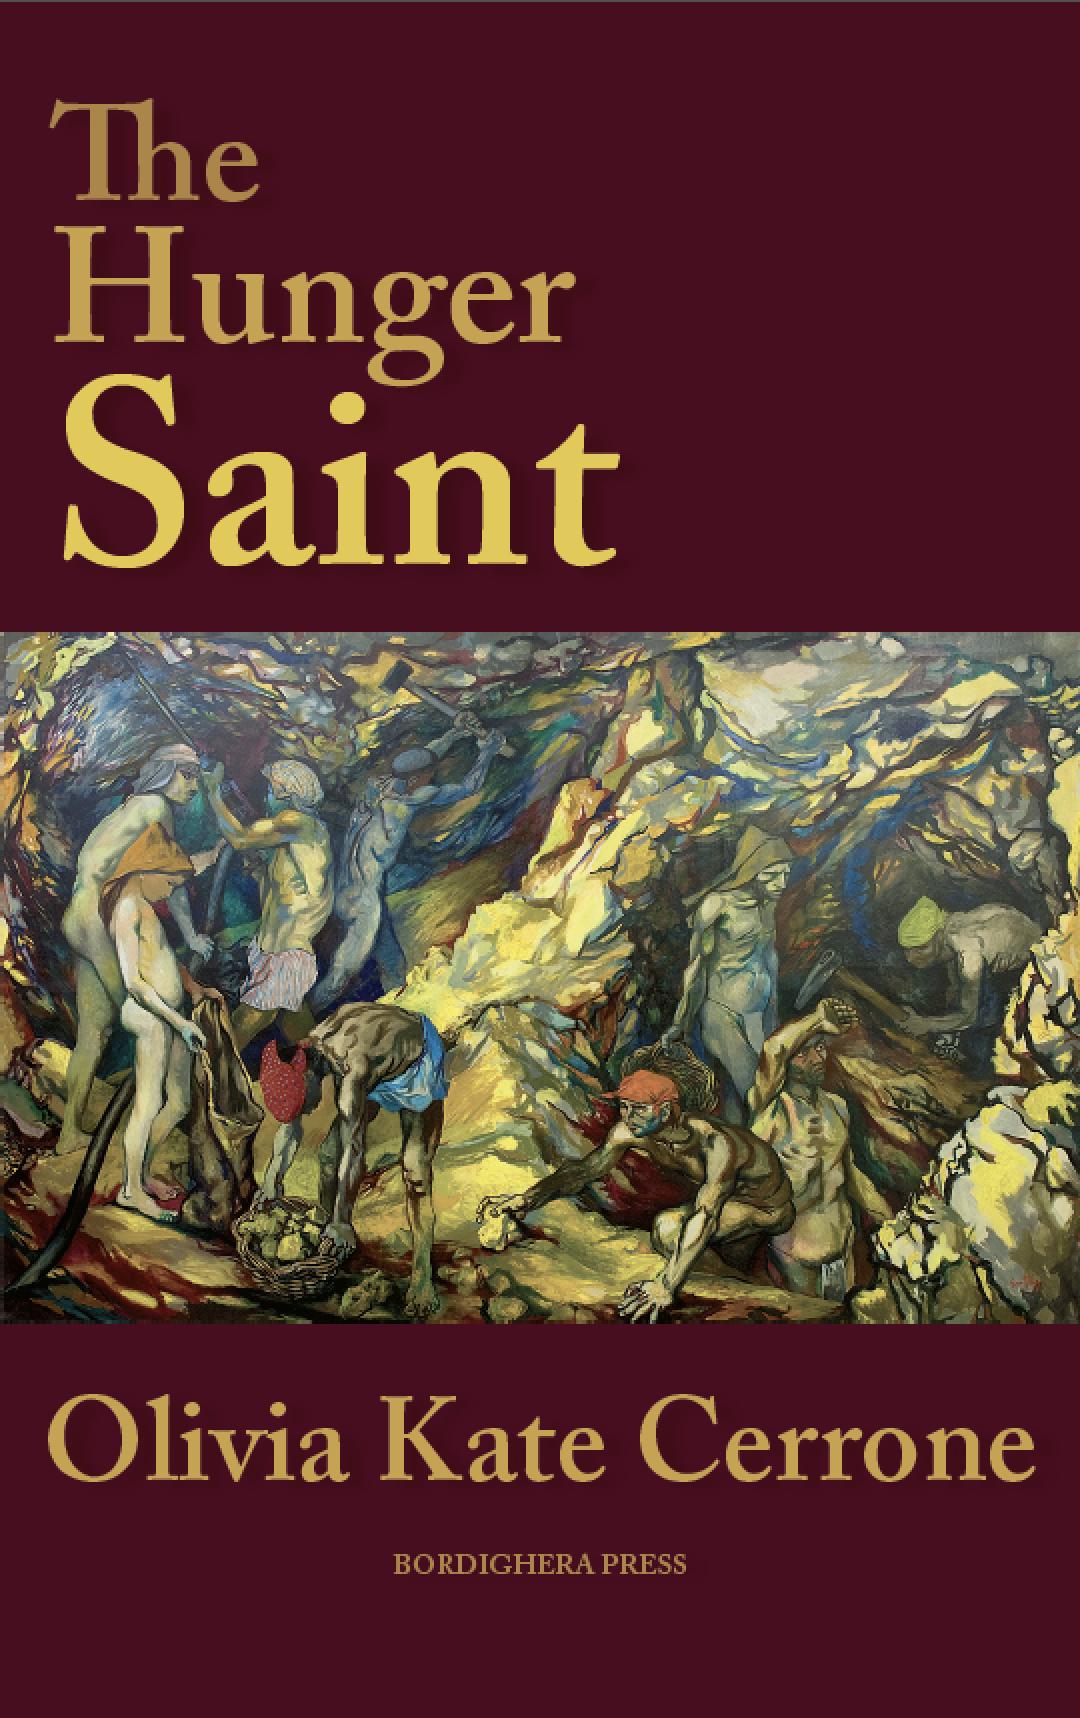 The Hunger Saint